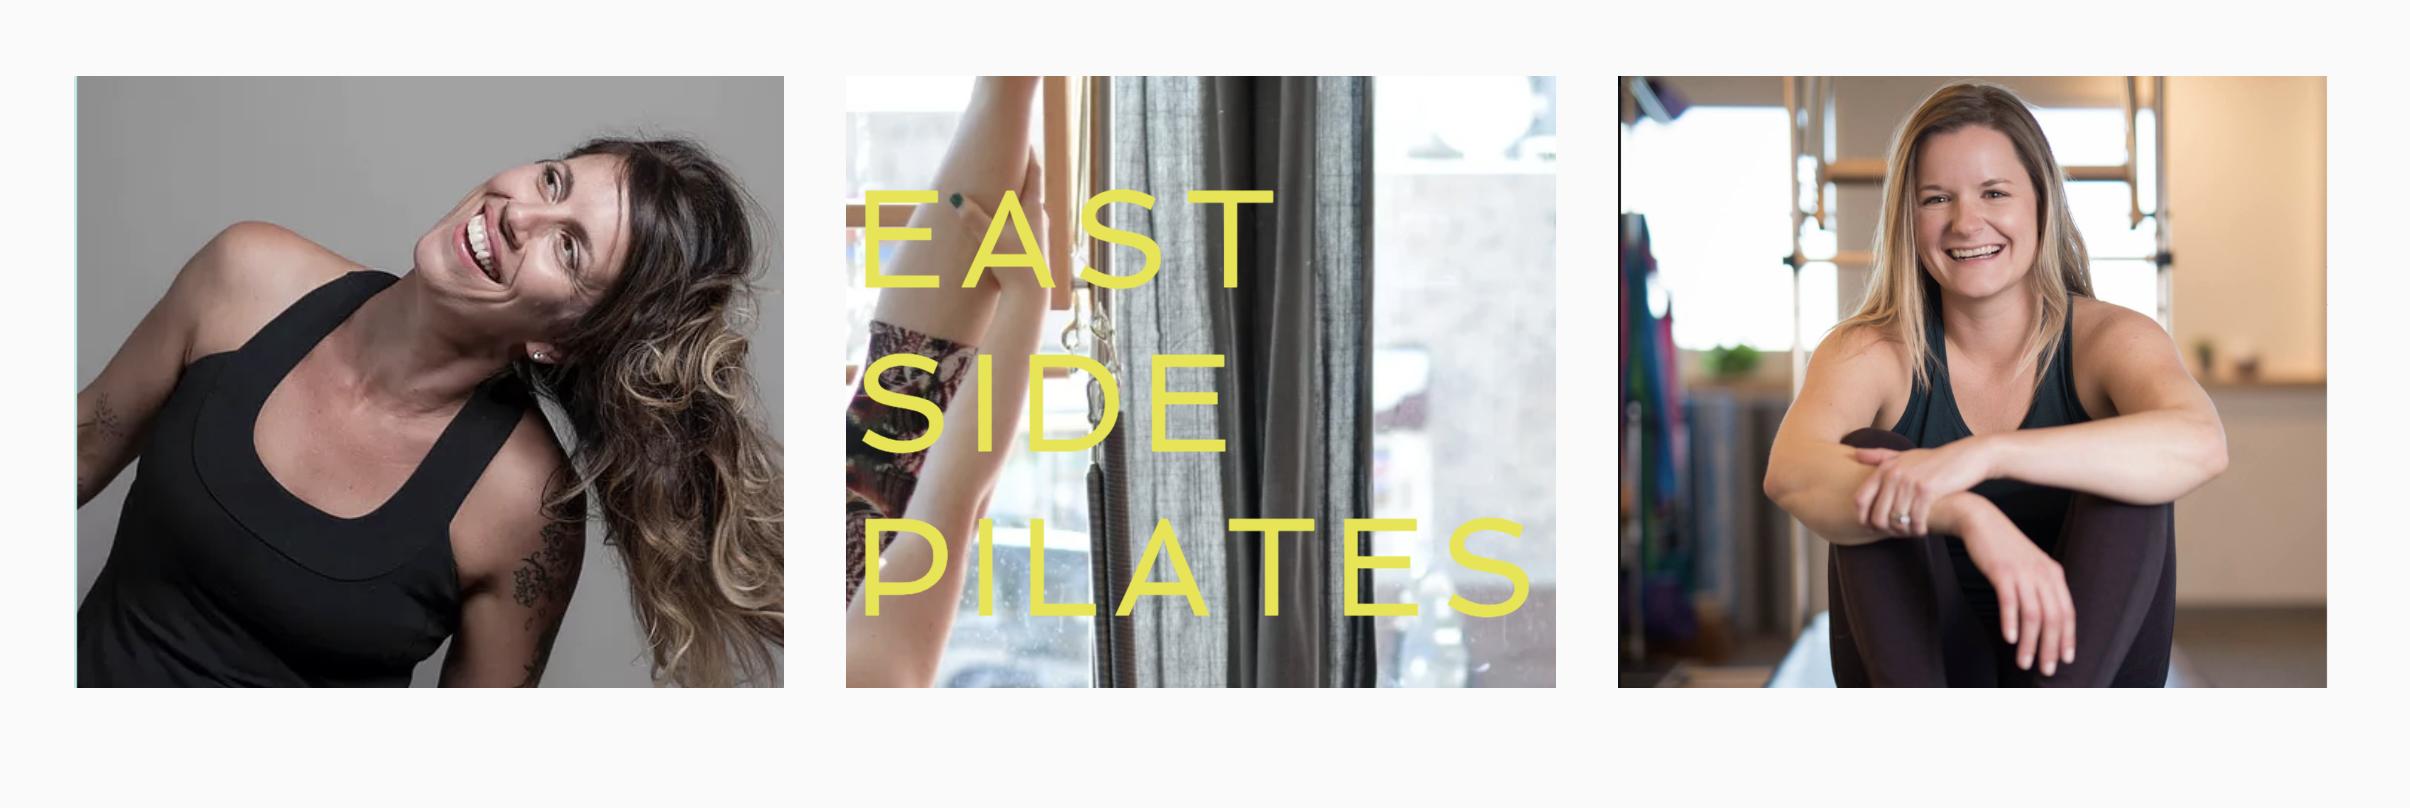 eastside pilates certification course teacher training